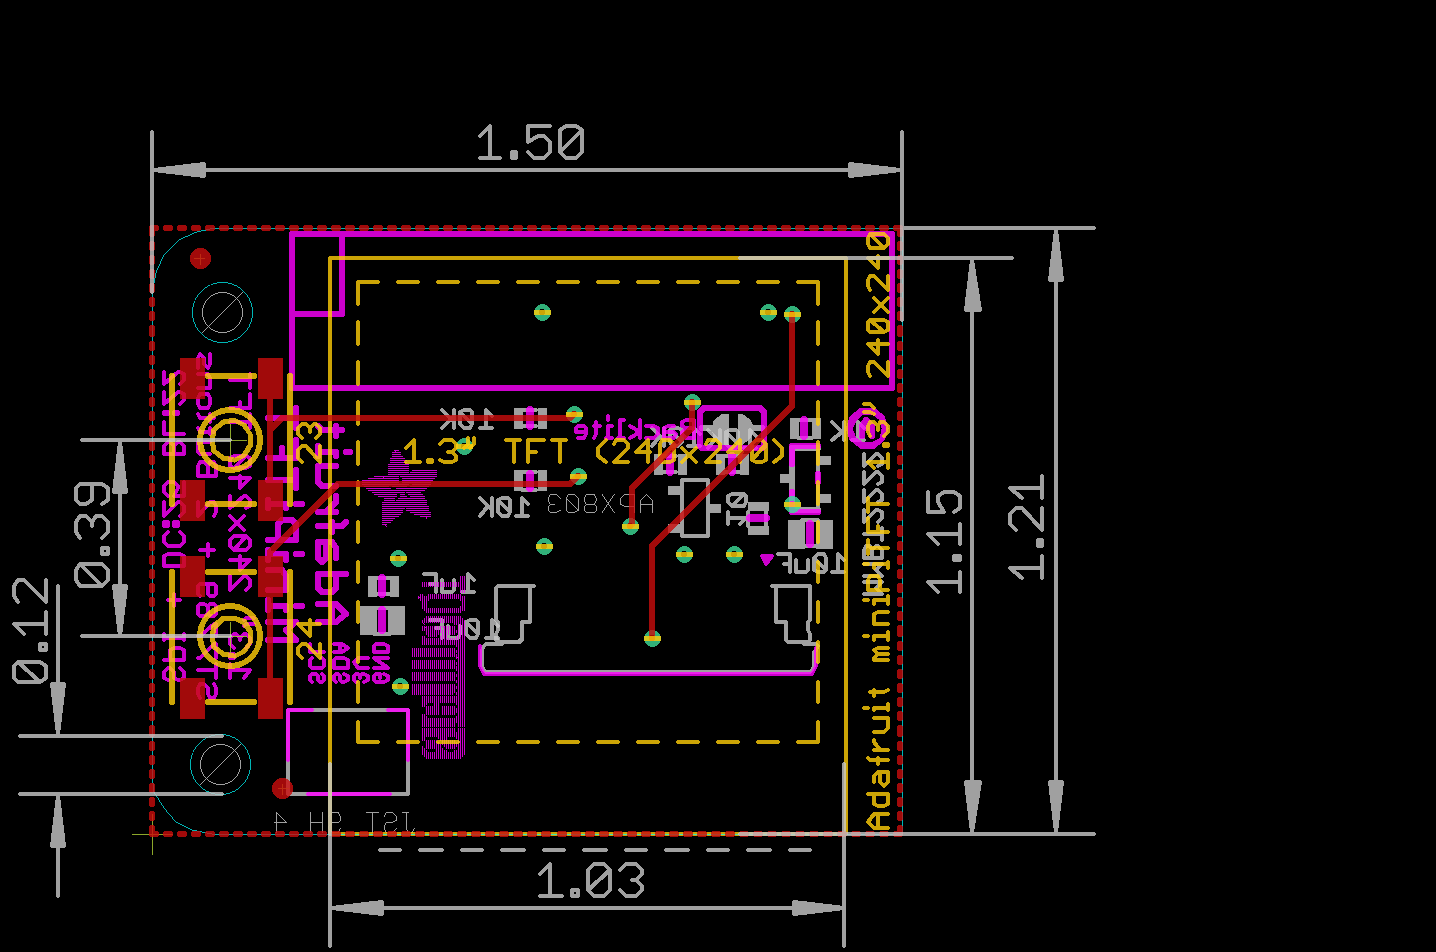 adafruit_products_1-3in_Pi_MiniTFT_fab_print.png